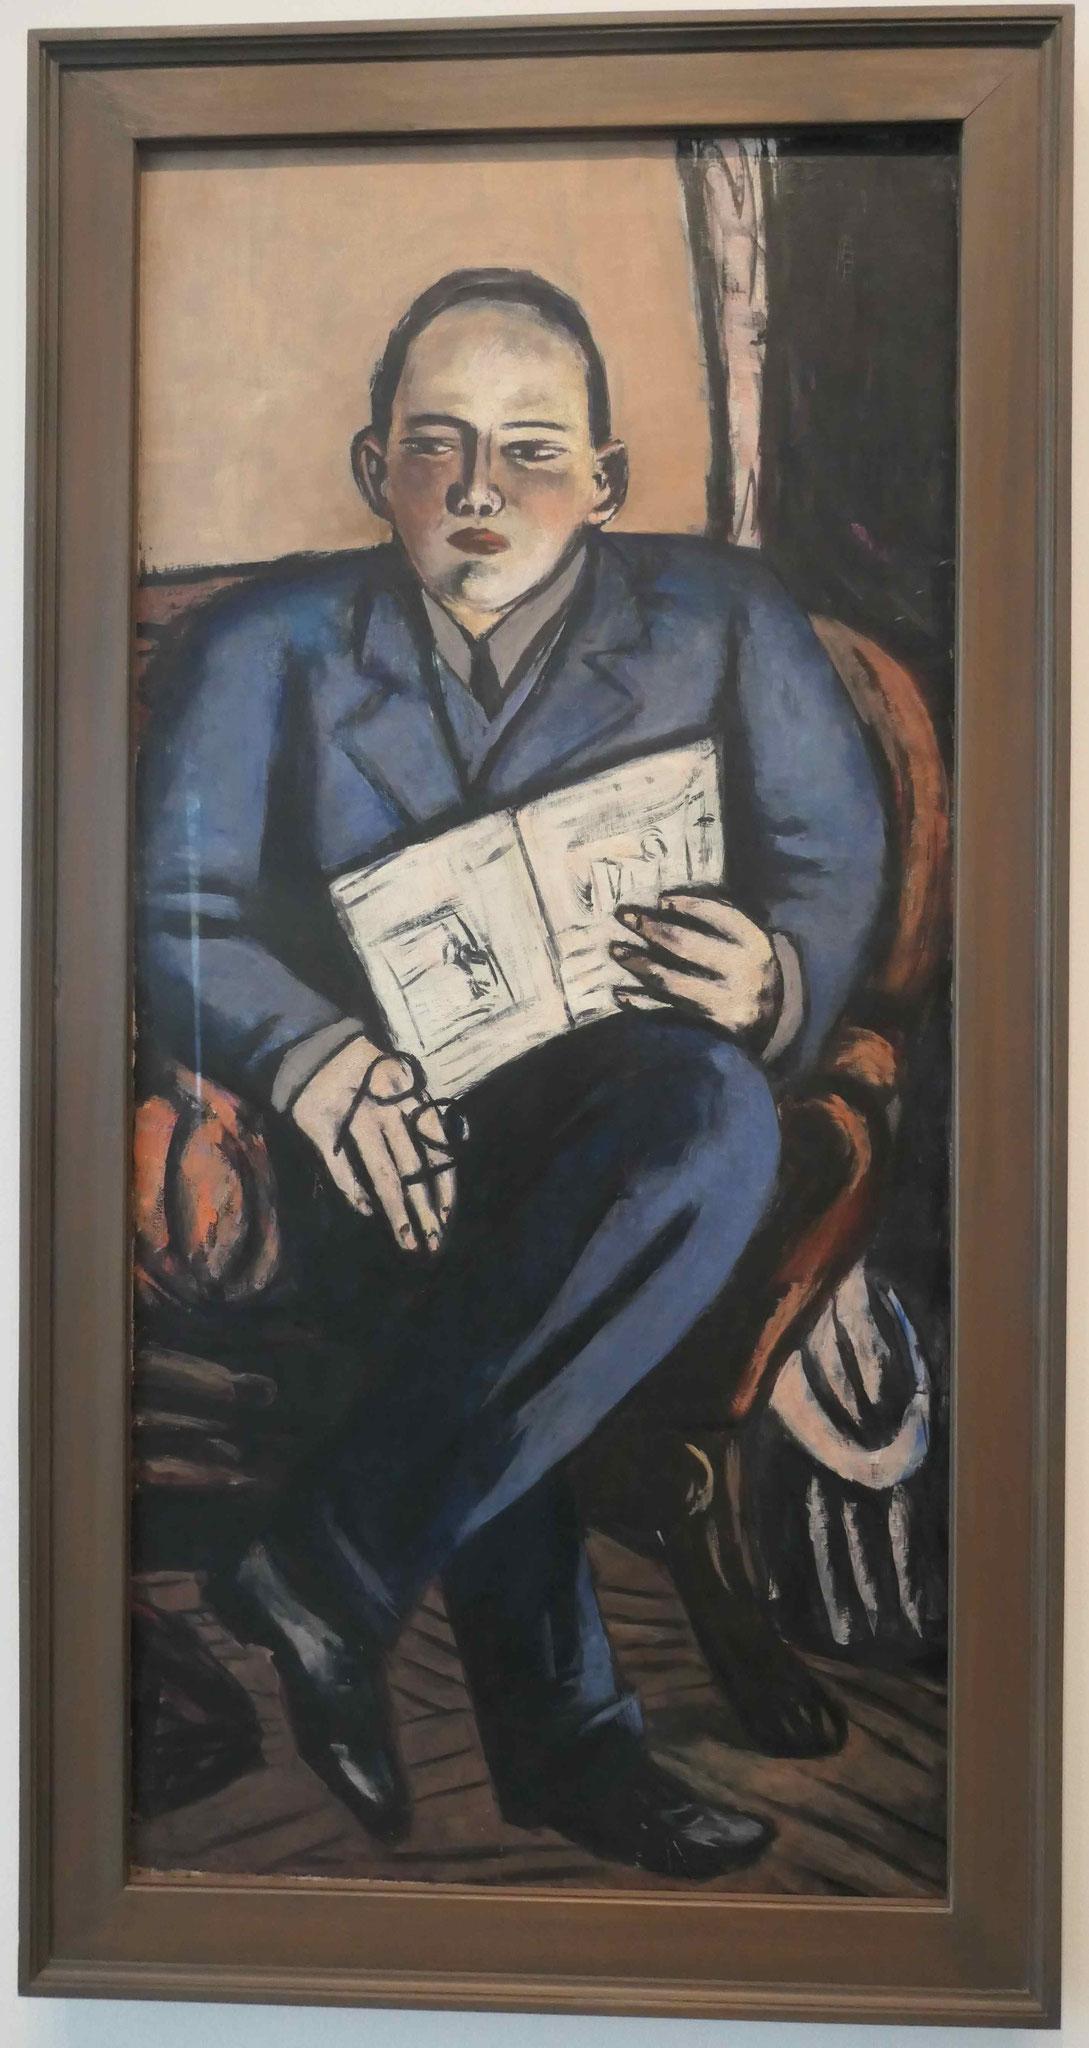 Max Beckmann, Bildnis Erhard Göpel, 1944, Neue Nationalgalerie Berlin